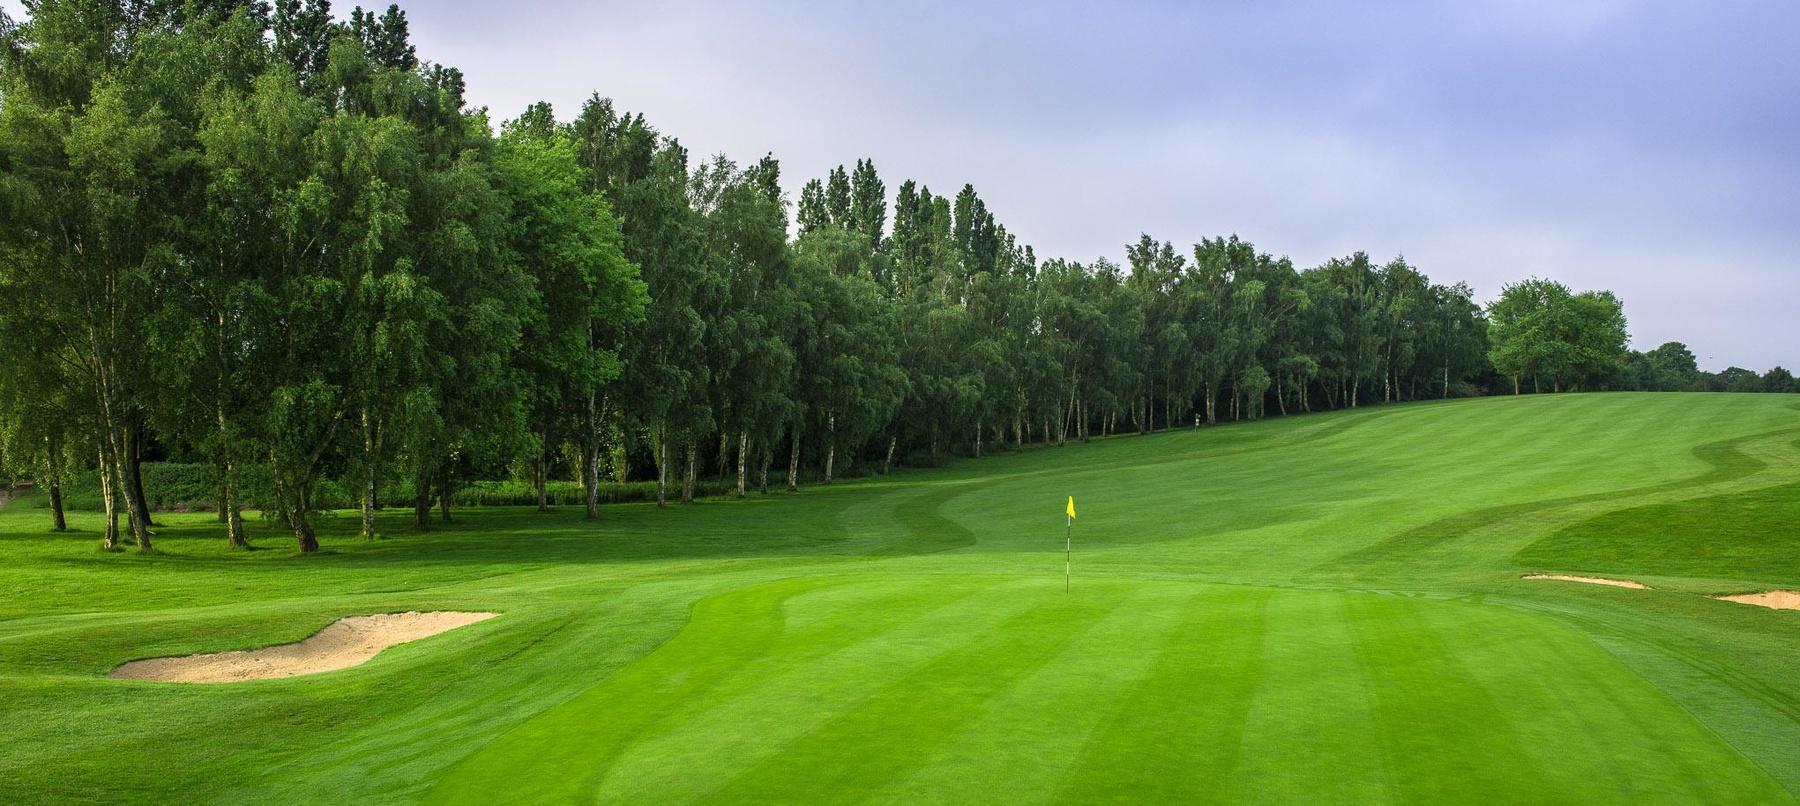 BGL_Hoebridge_cropHiseman_GolfCourse_72dpi_EmailWeb-7